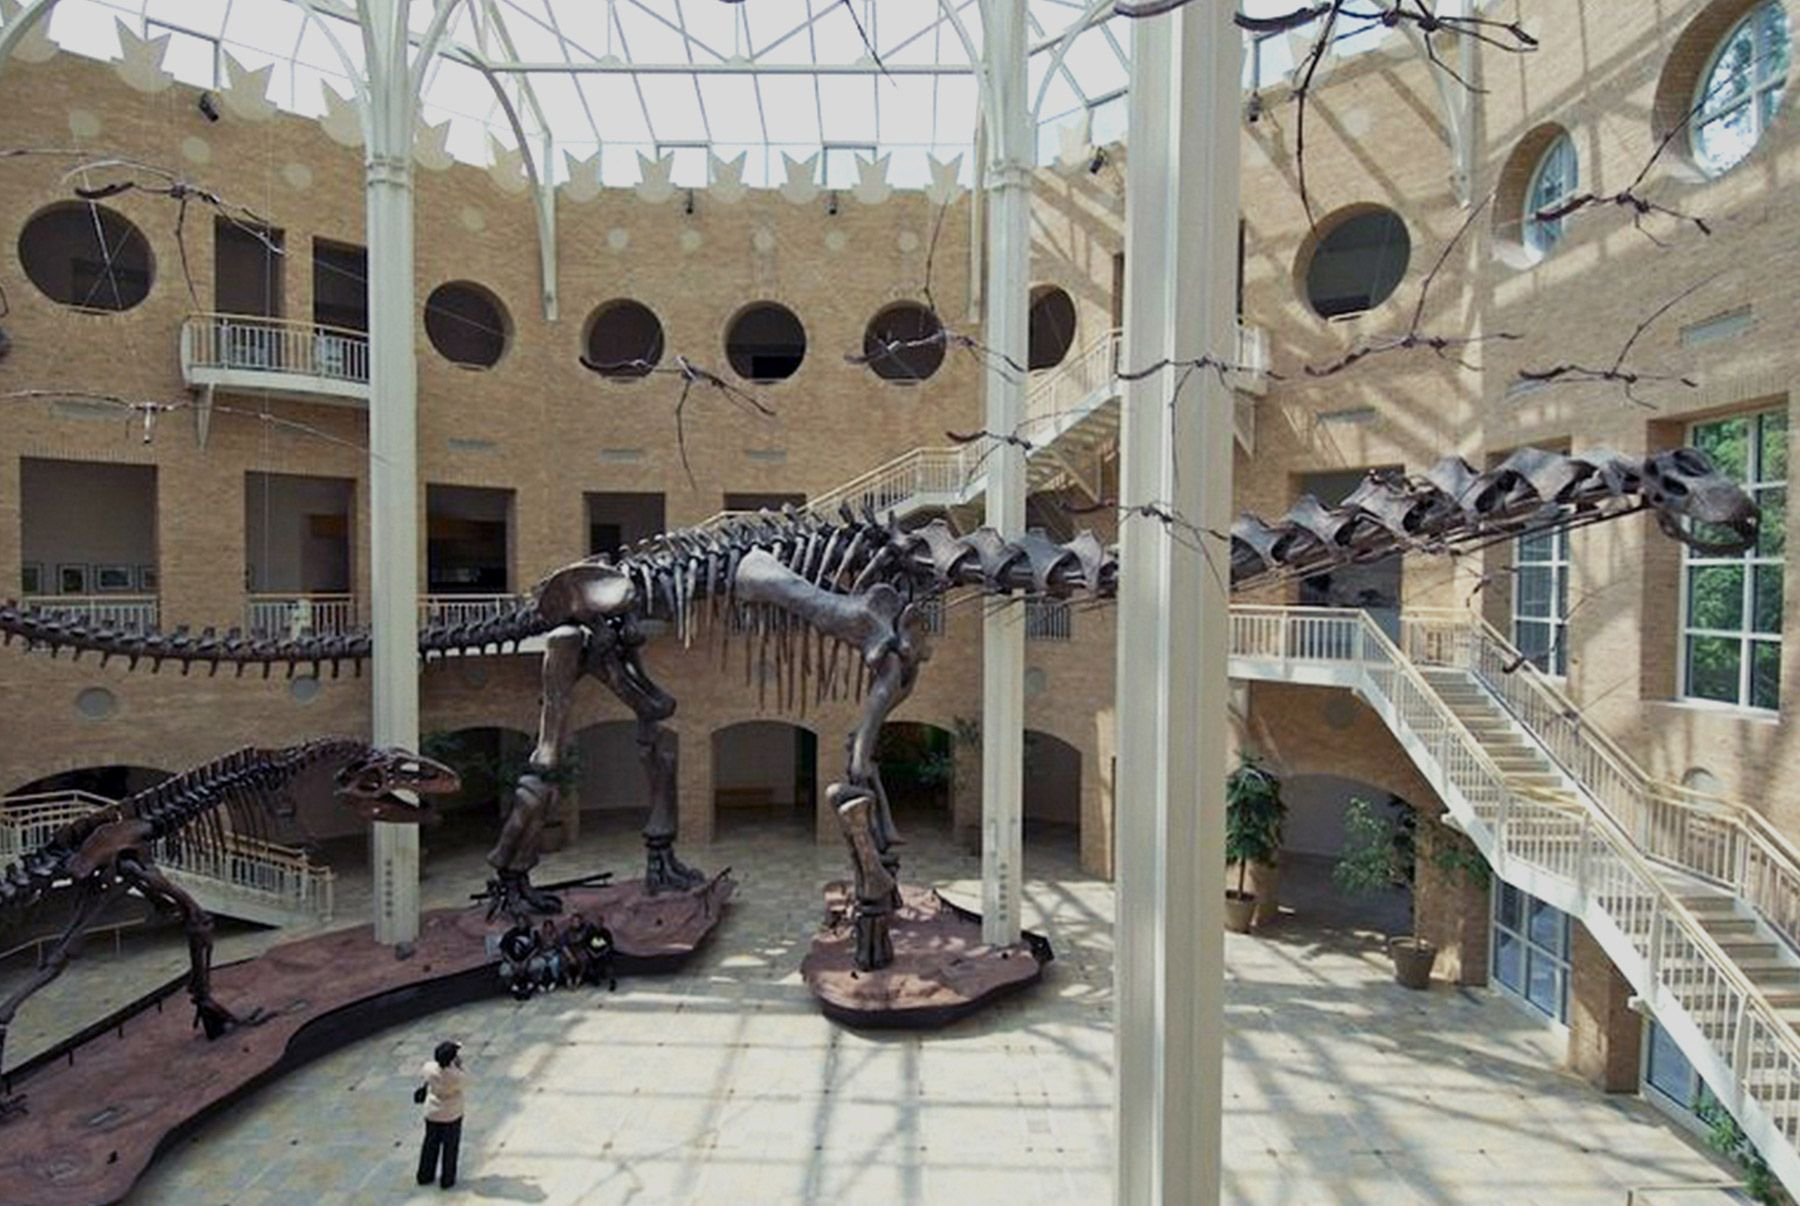 Natural History Museum Dinosaurs - Google